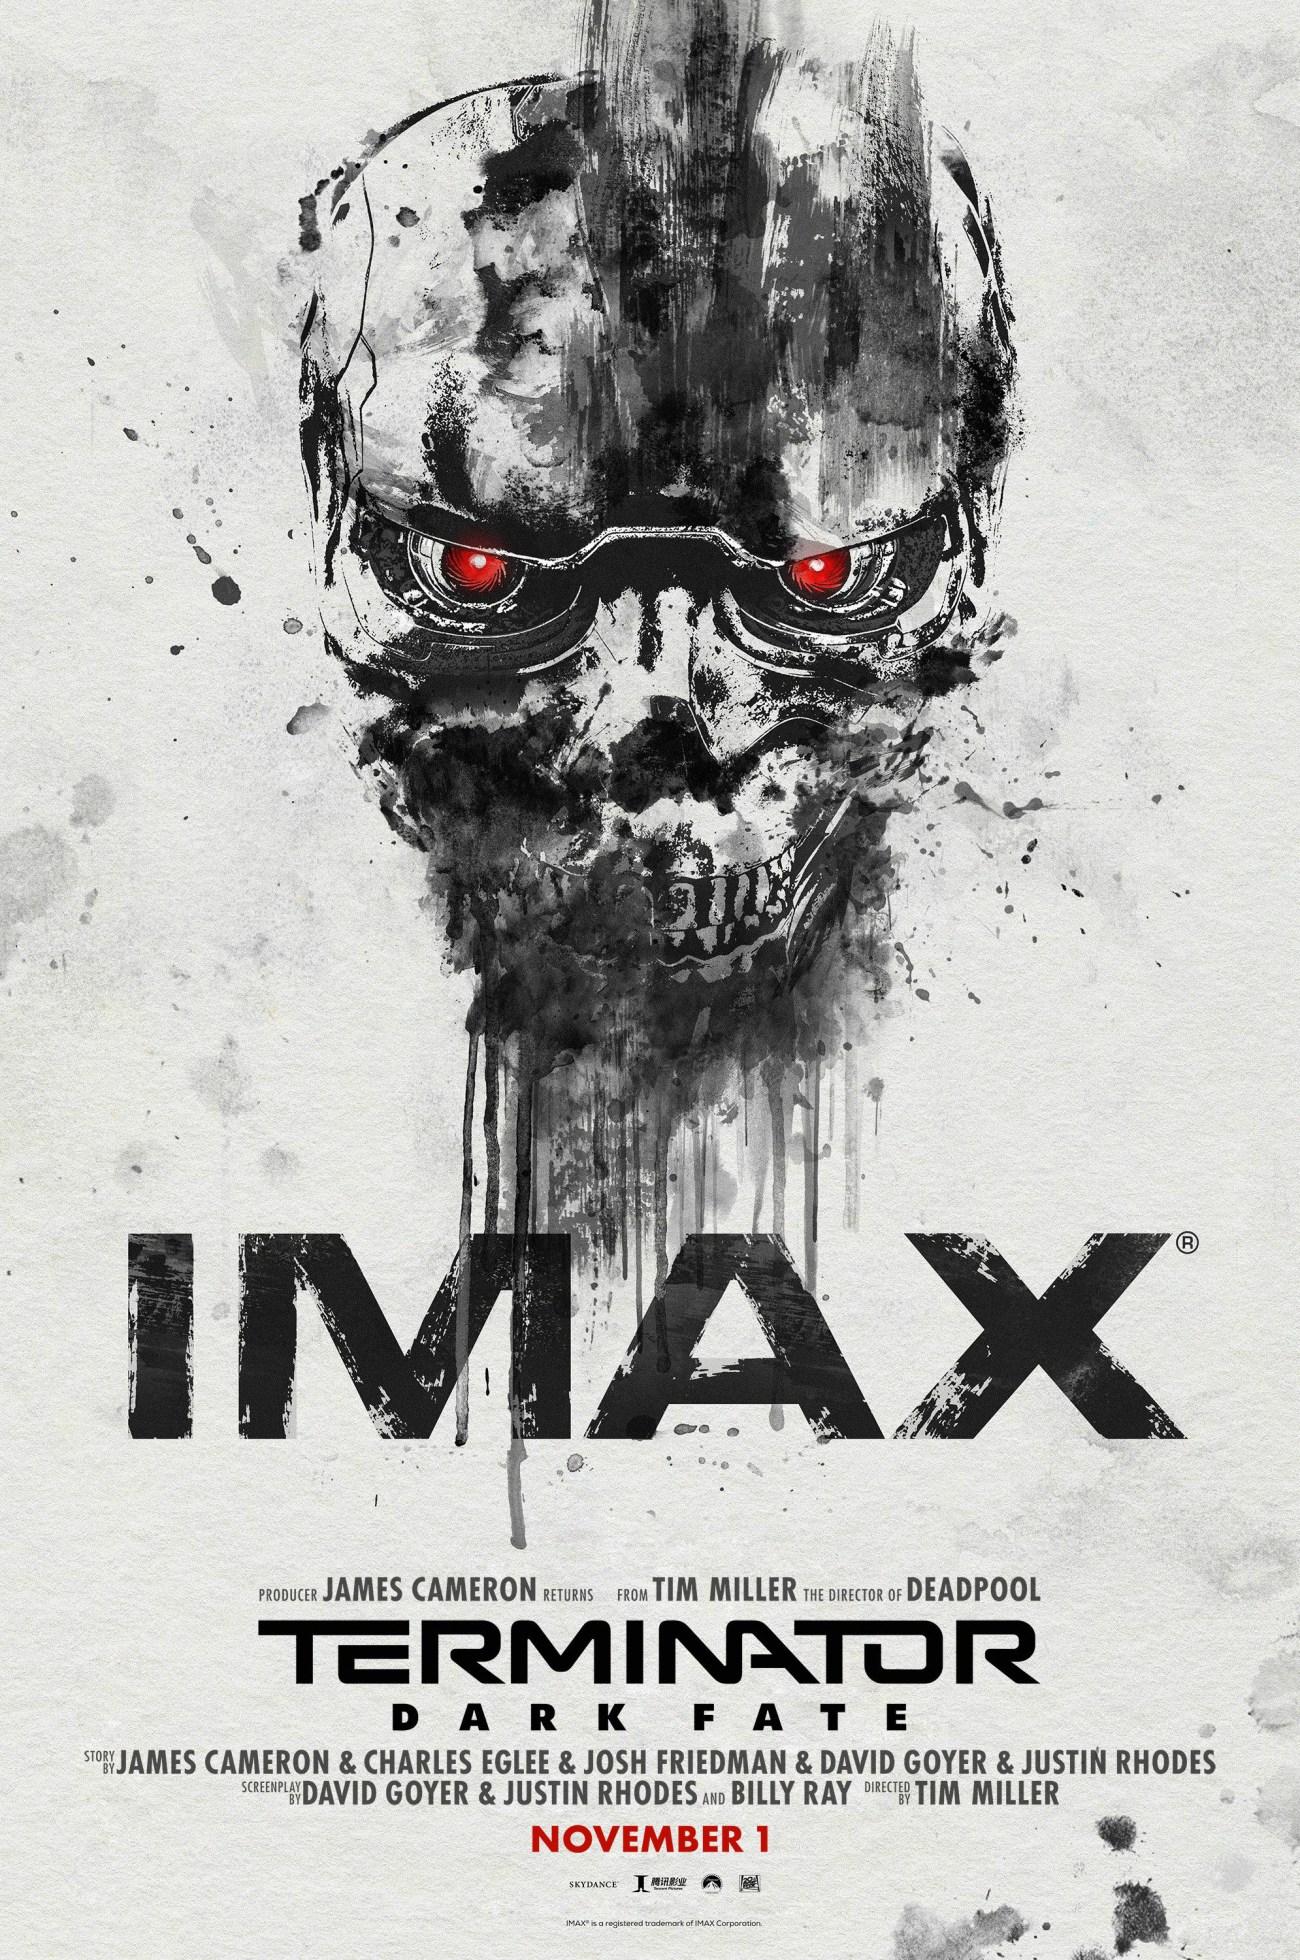 Póster IMAX de Terminator: Dark Fate (2019). Imagen: impawards.com